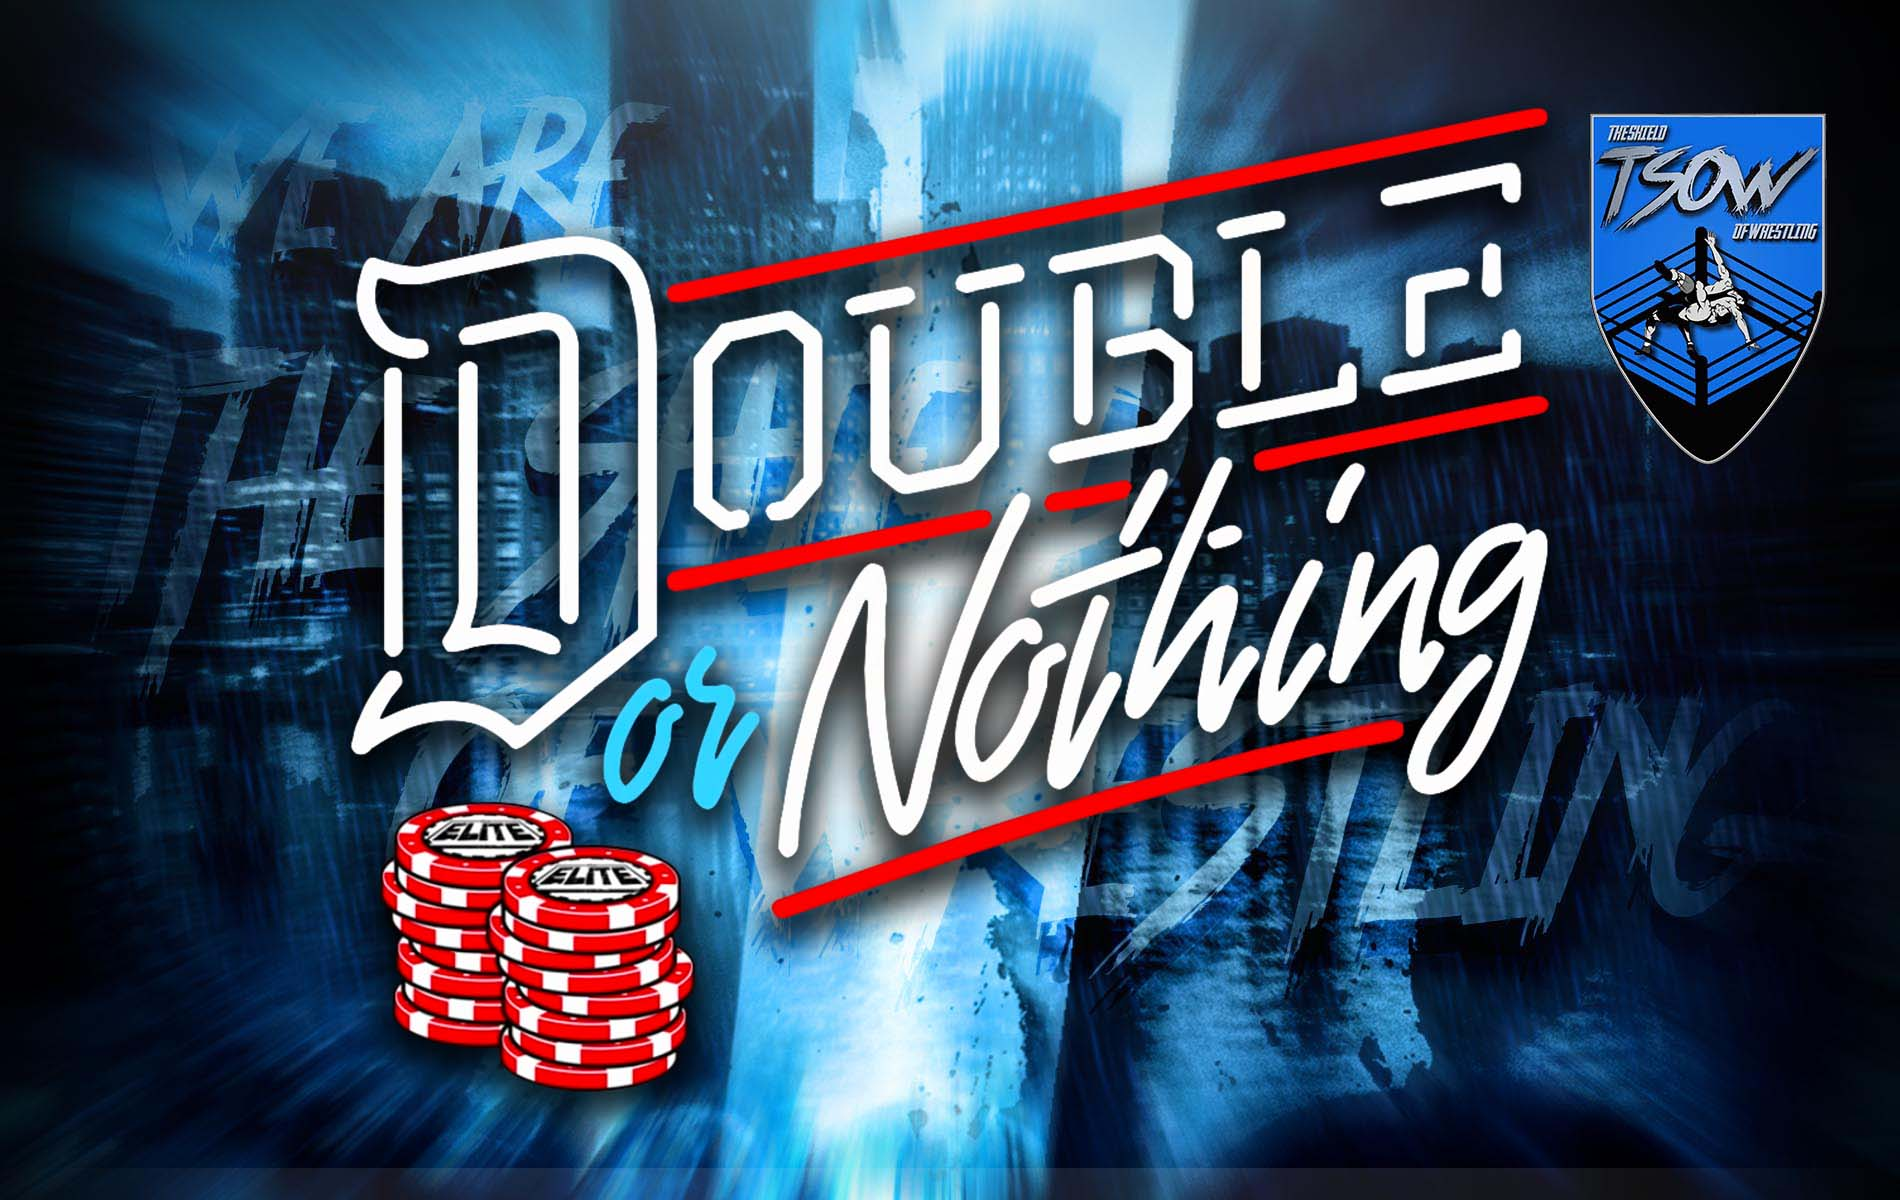 Double or Nothing: per Dave Meltzer è stato un successo